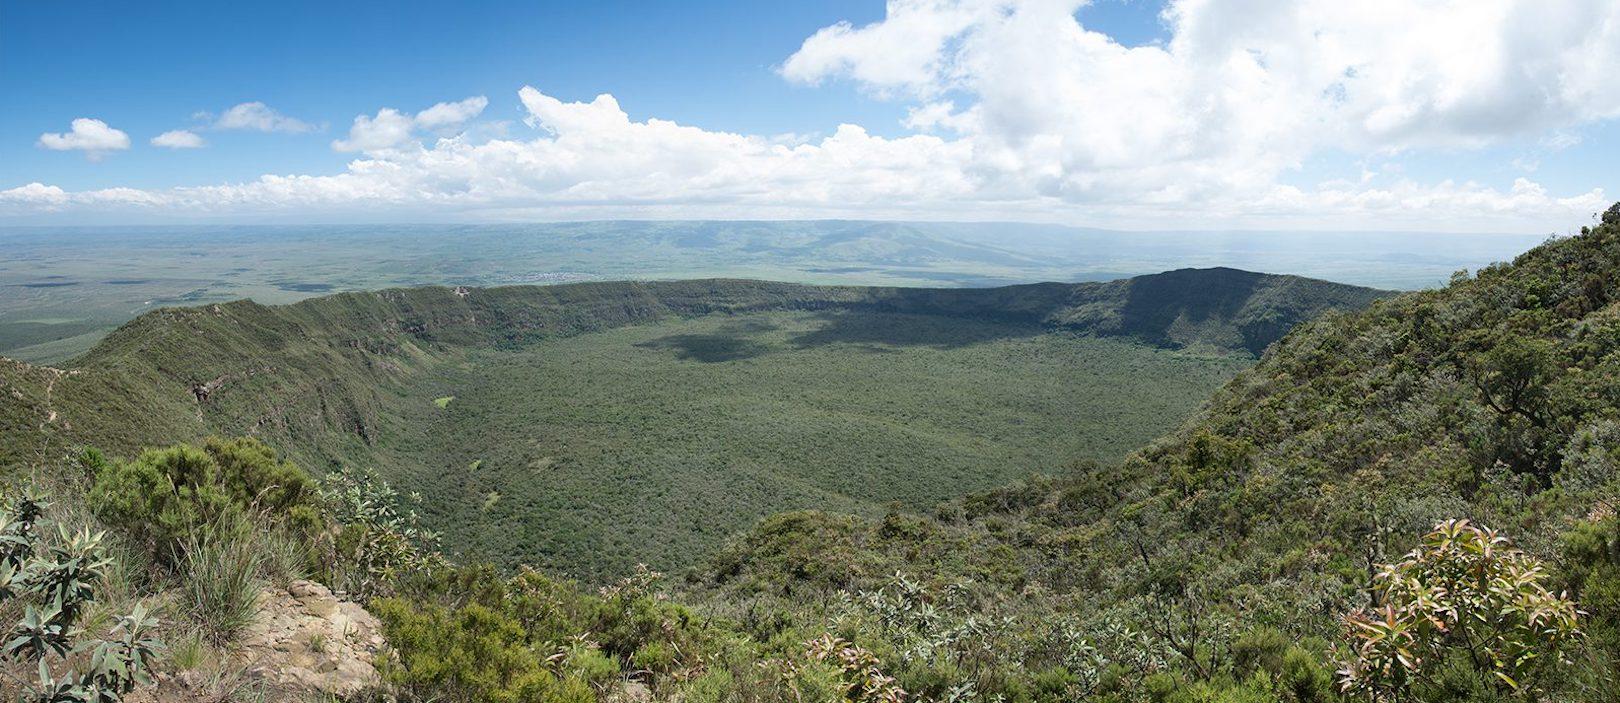 Mount Longonot National Park, Kenya